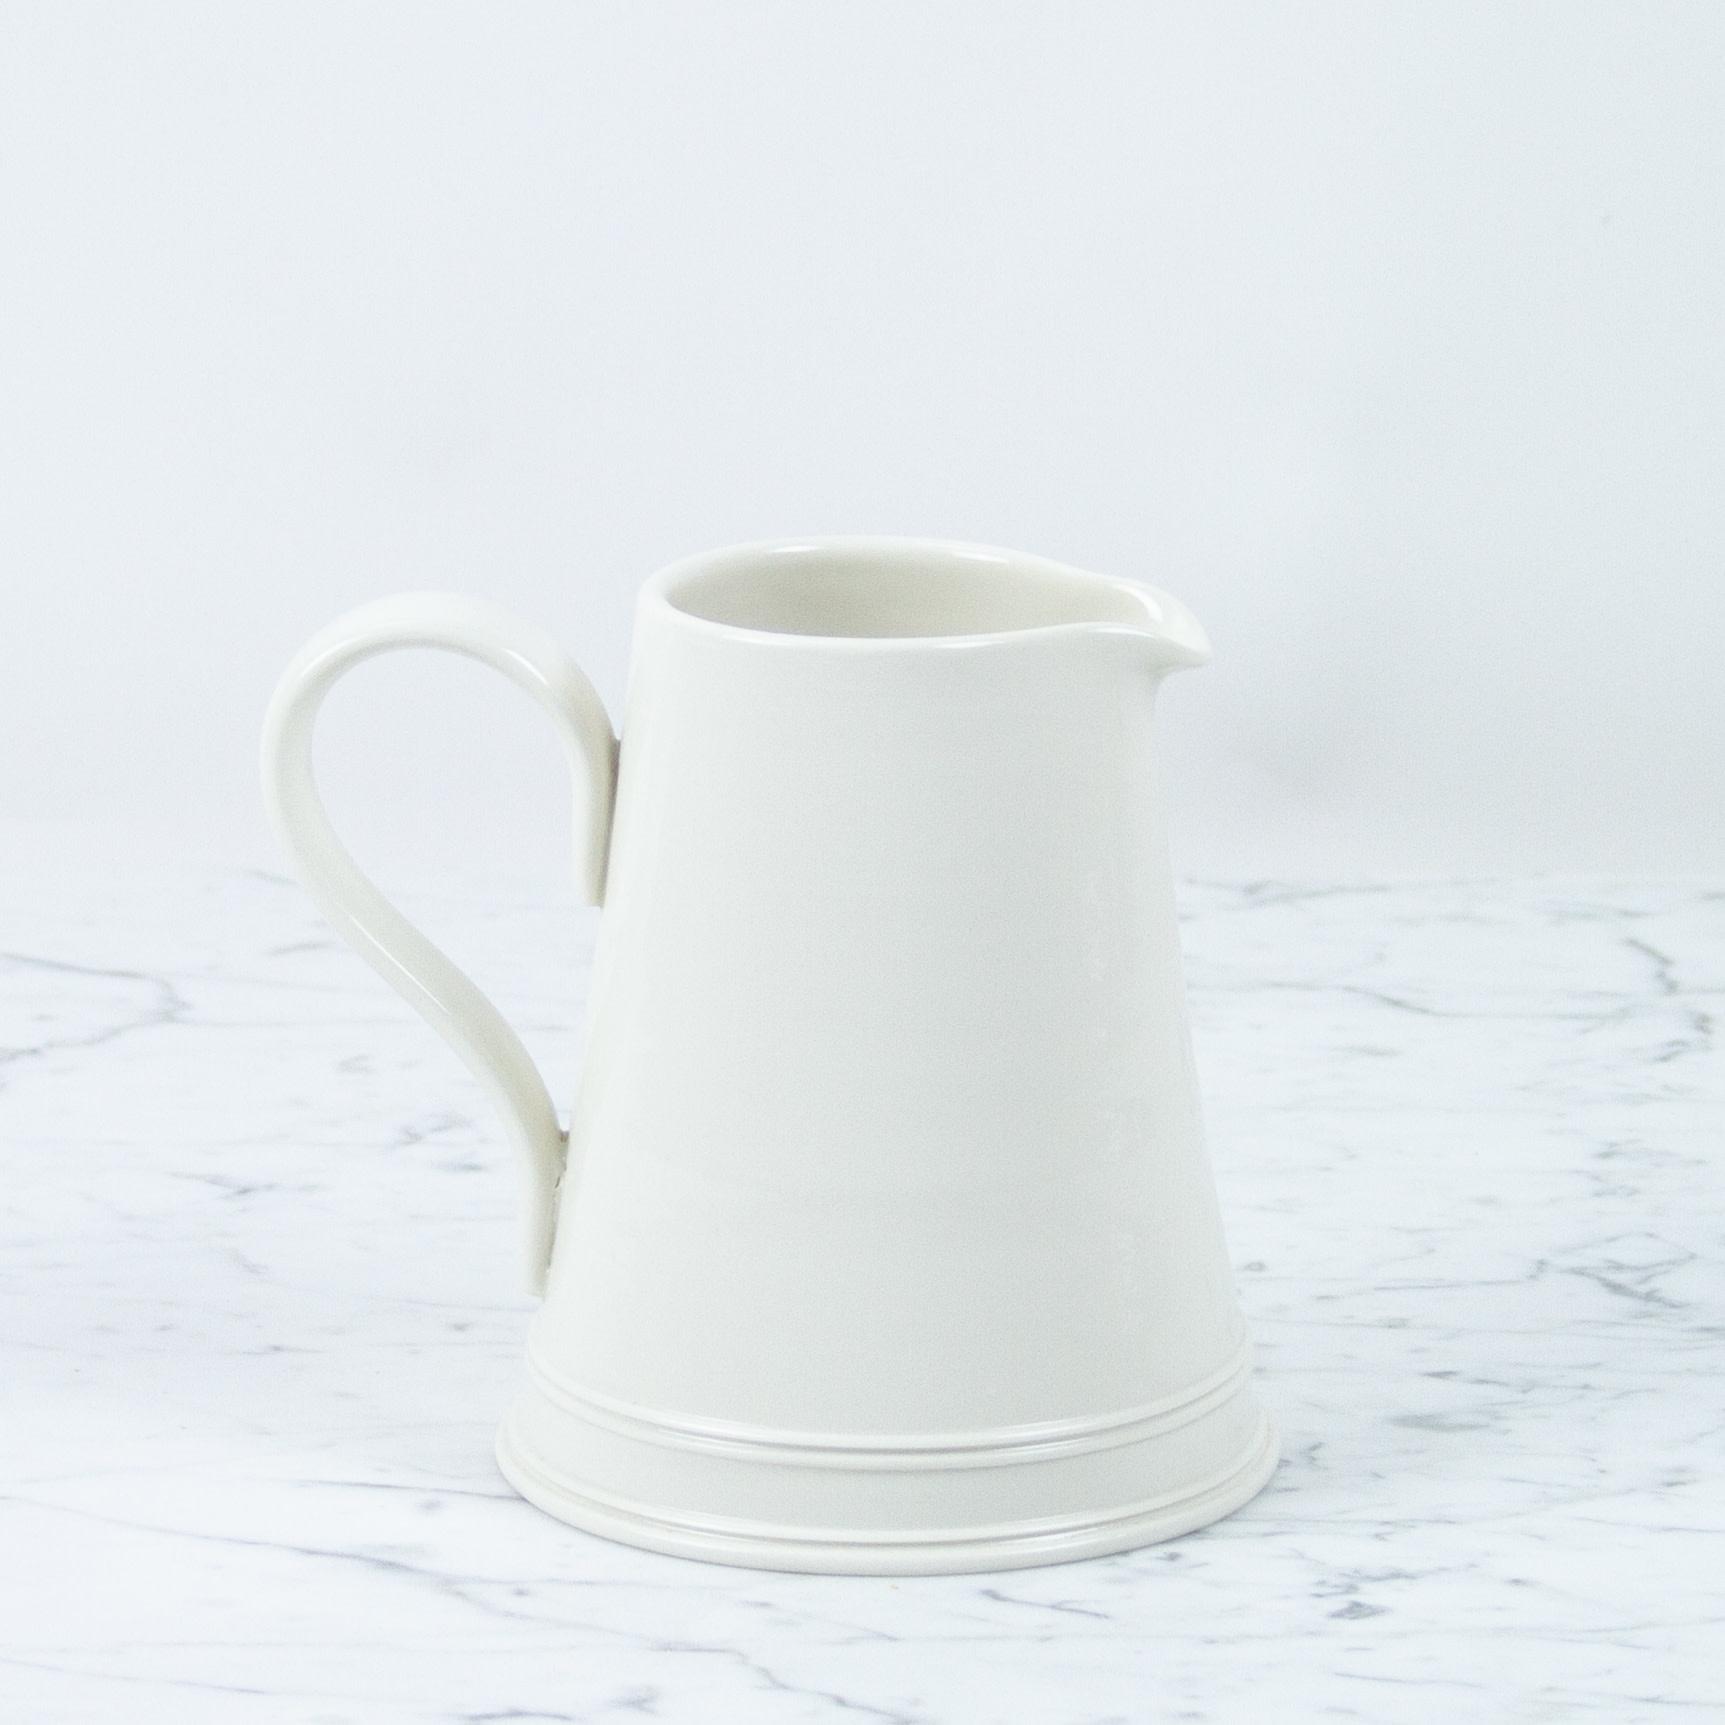 "John Julian John Julian Hand Thrown Classical Dairy Pitcher - Small - 6 1/4"" - 500 ml"